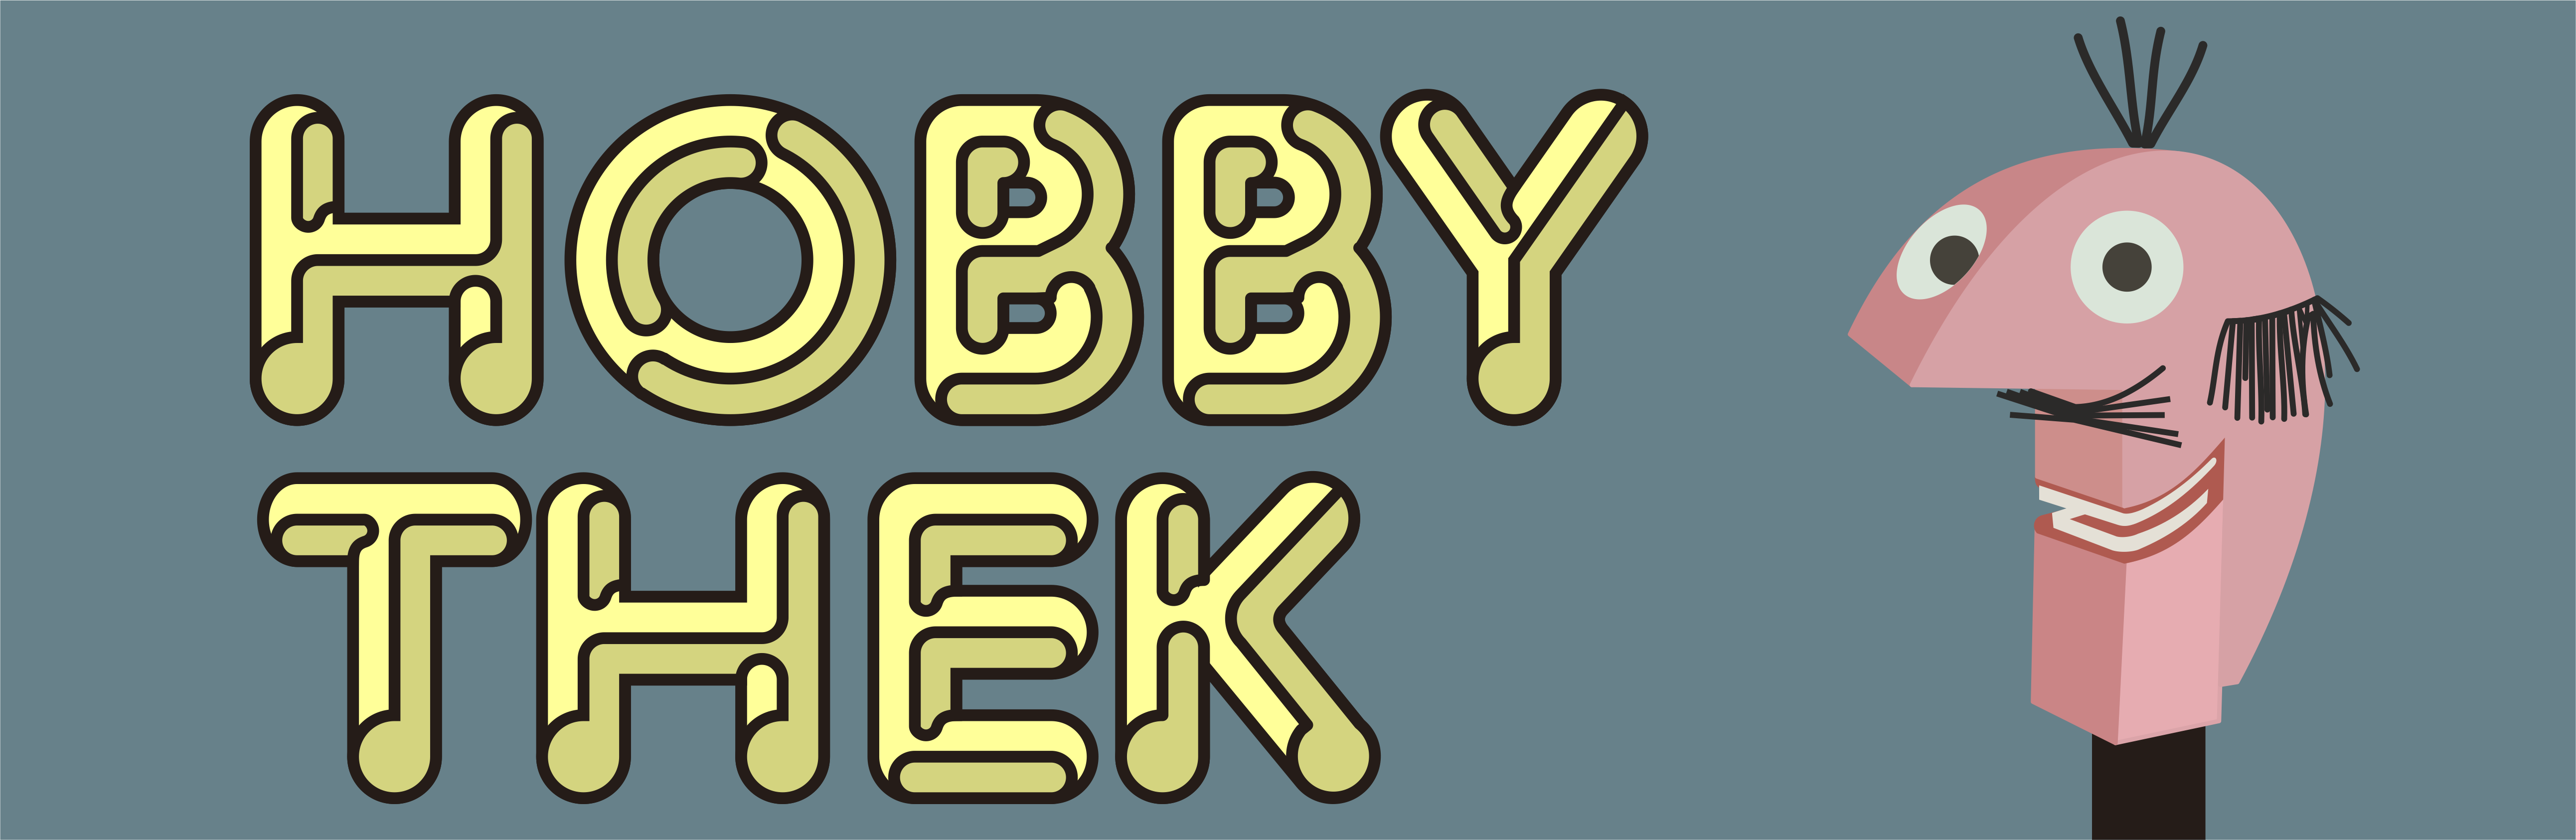 Hobbythek 5